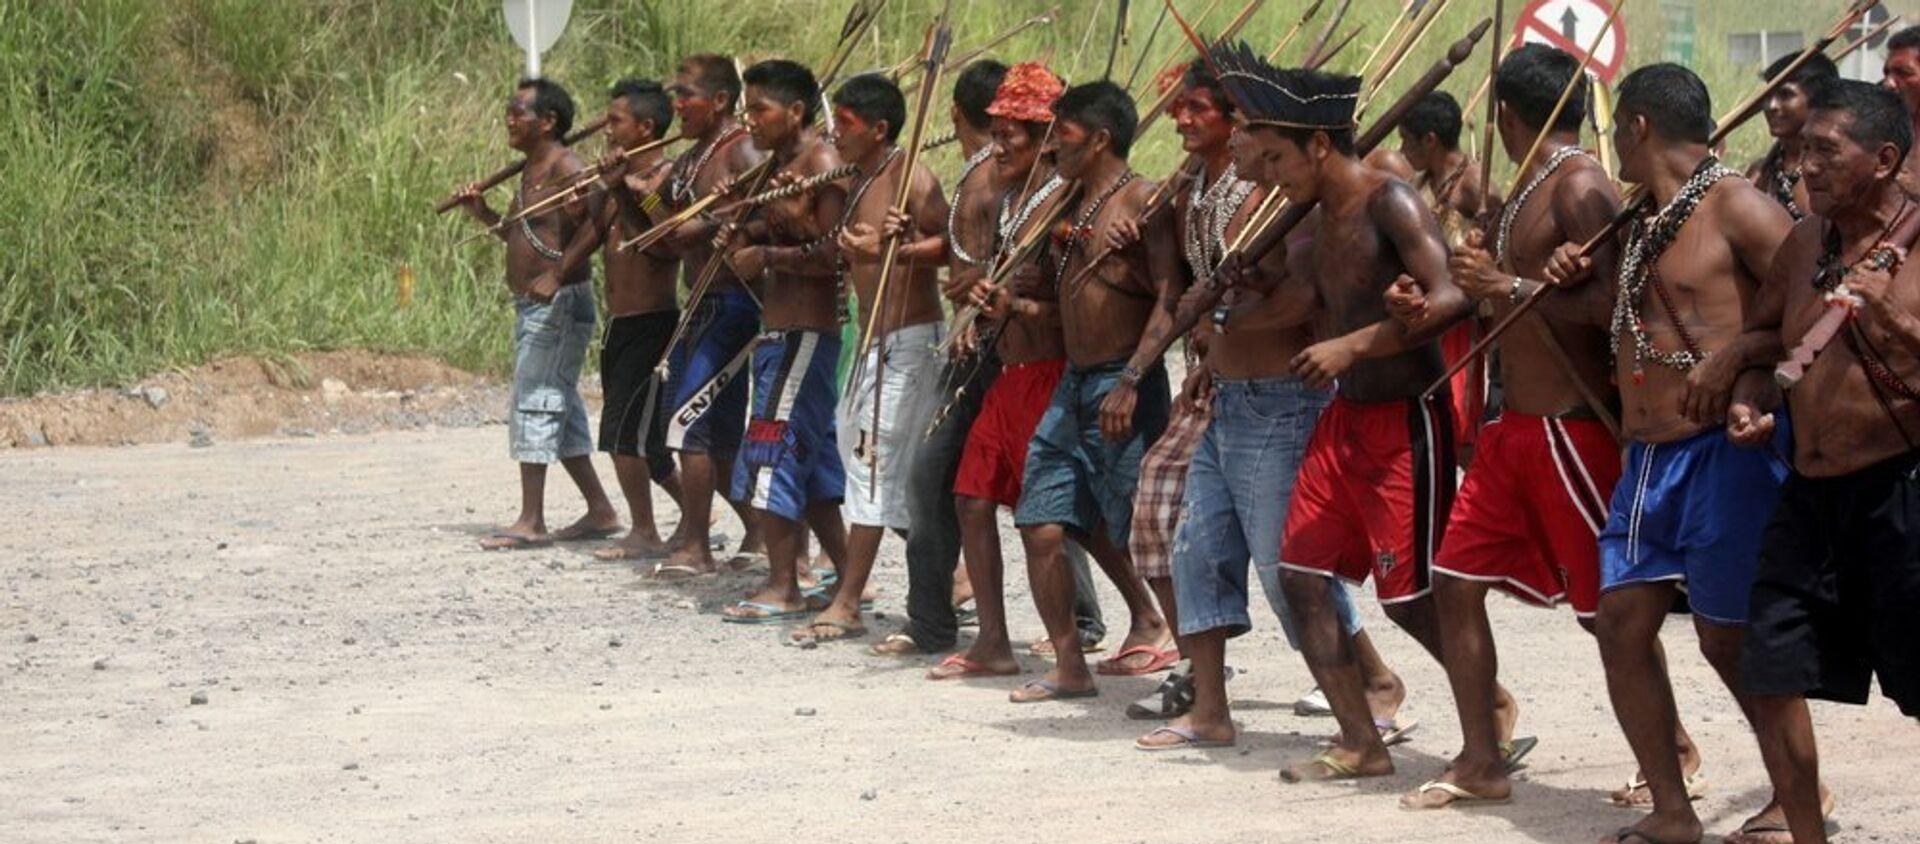 Los indígenas de Brasil - Sputnik Mundo, 1920, 29.01.2021